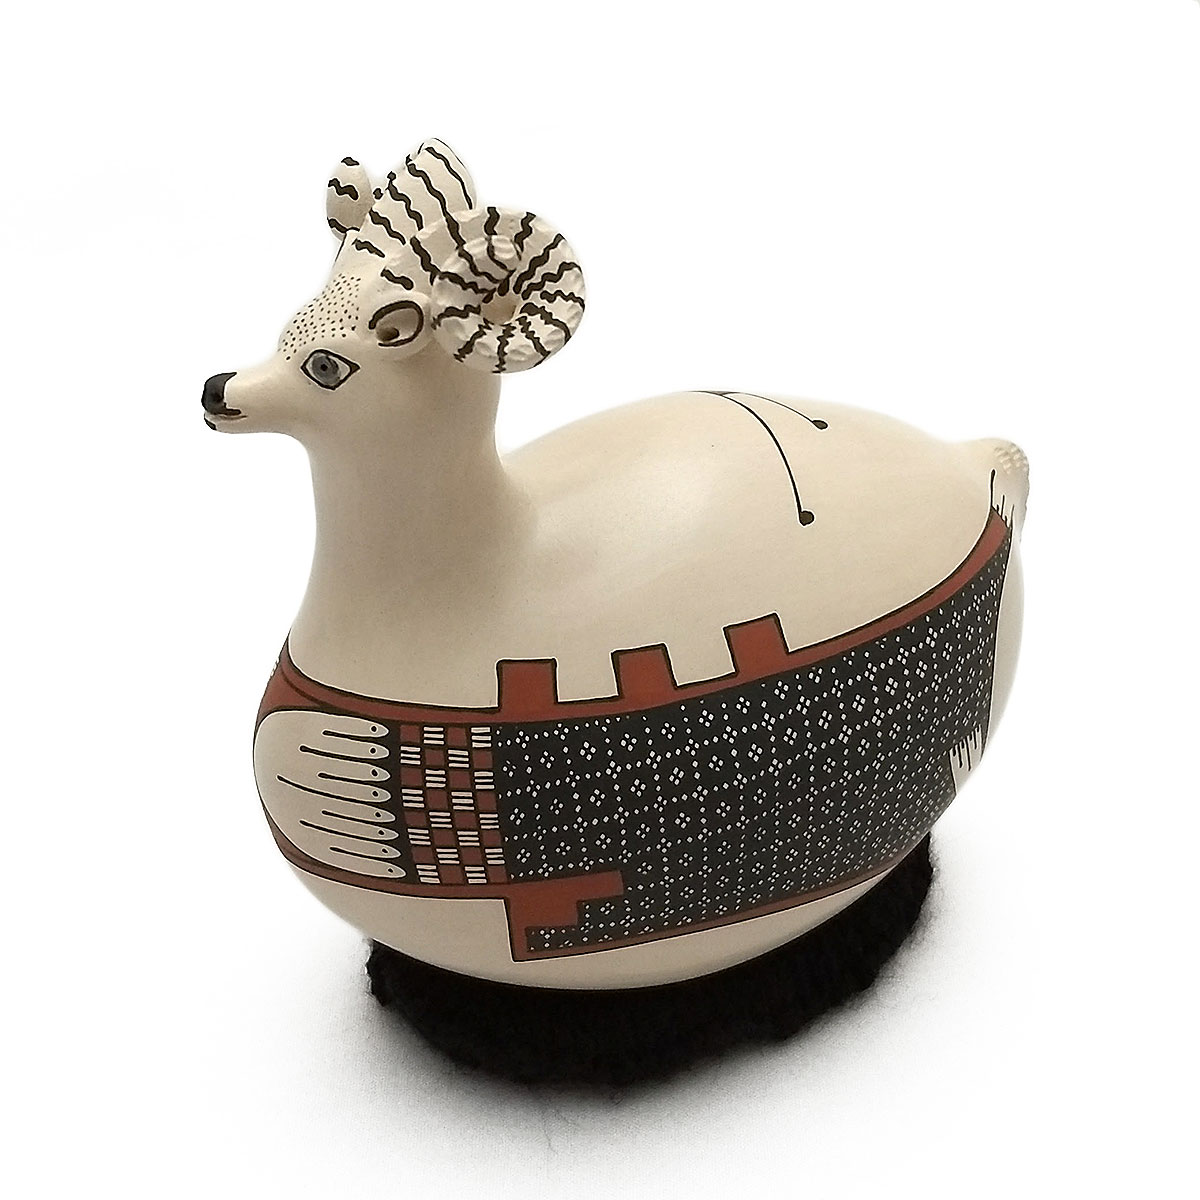 Gerardo Tena Gerardo Tena: Small Bighorn Effigy Bighorn Sheep